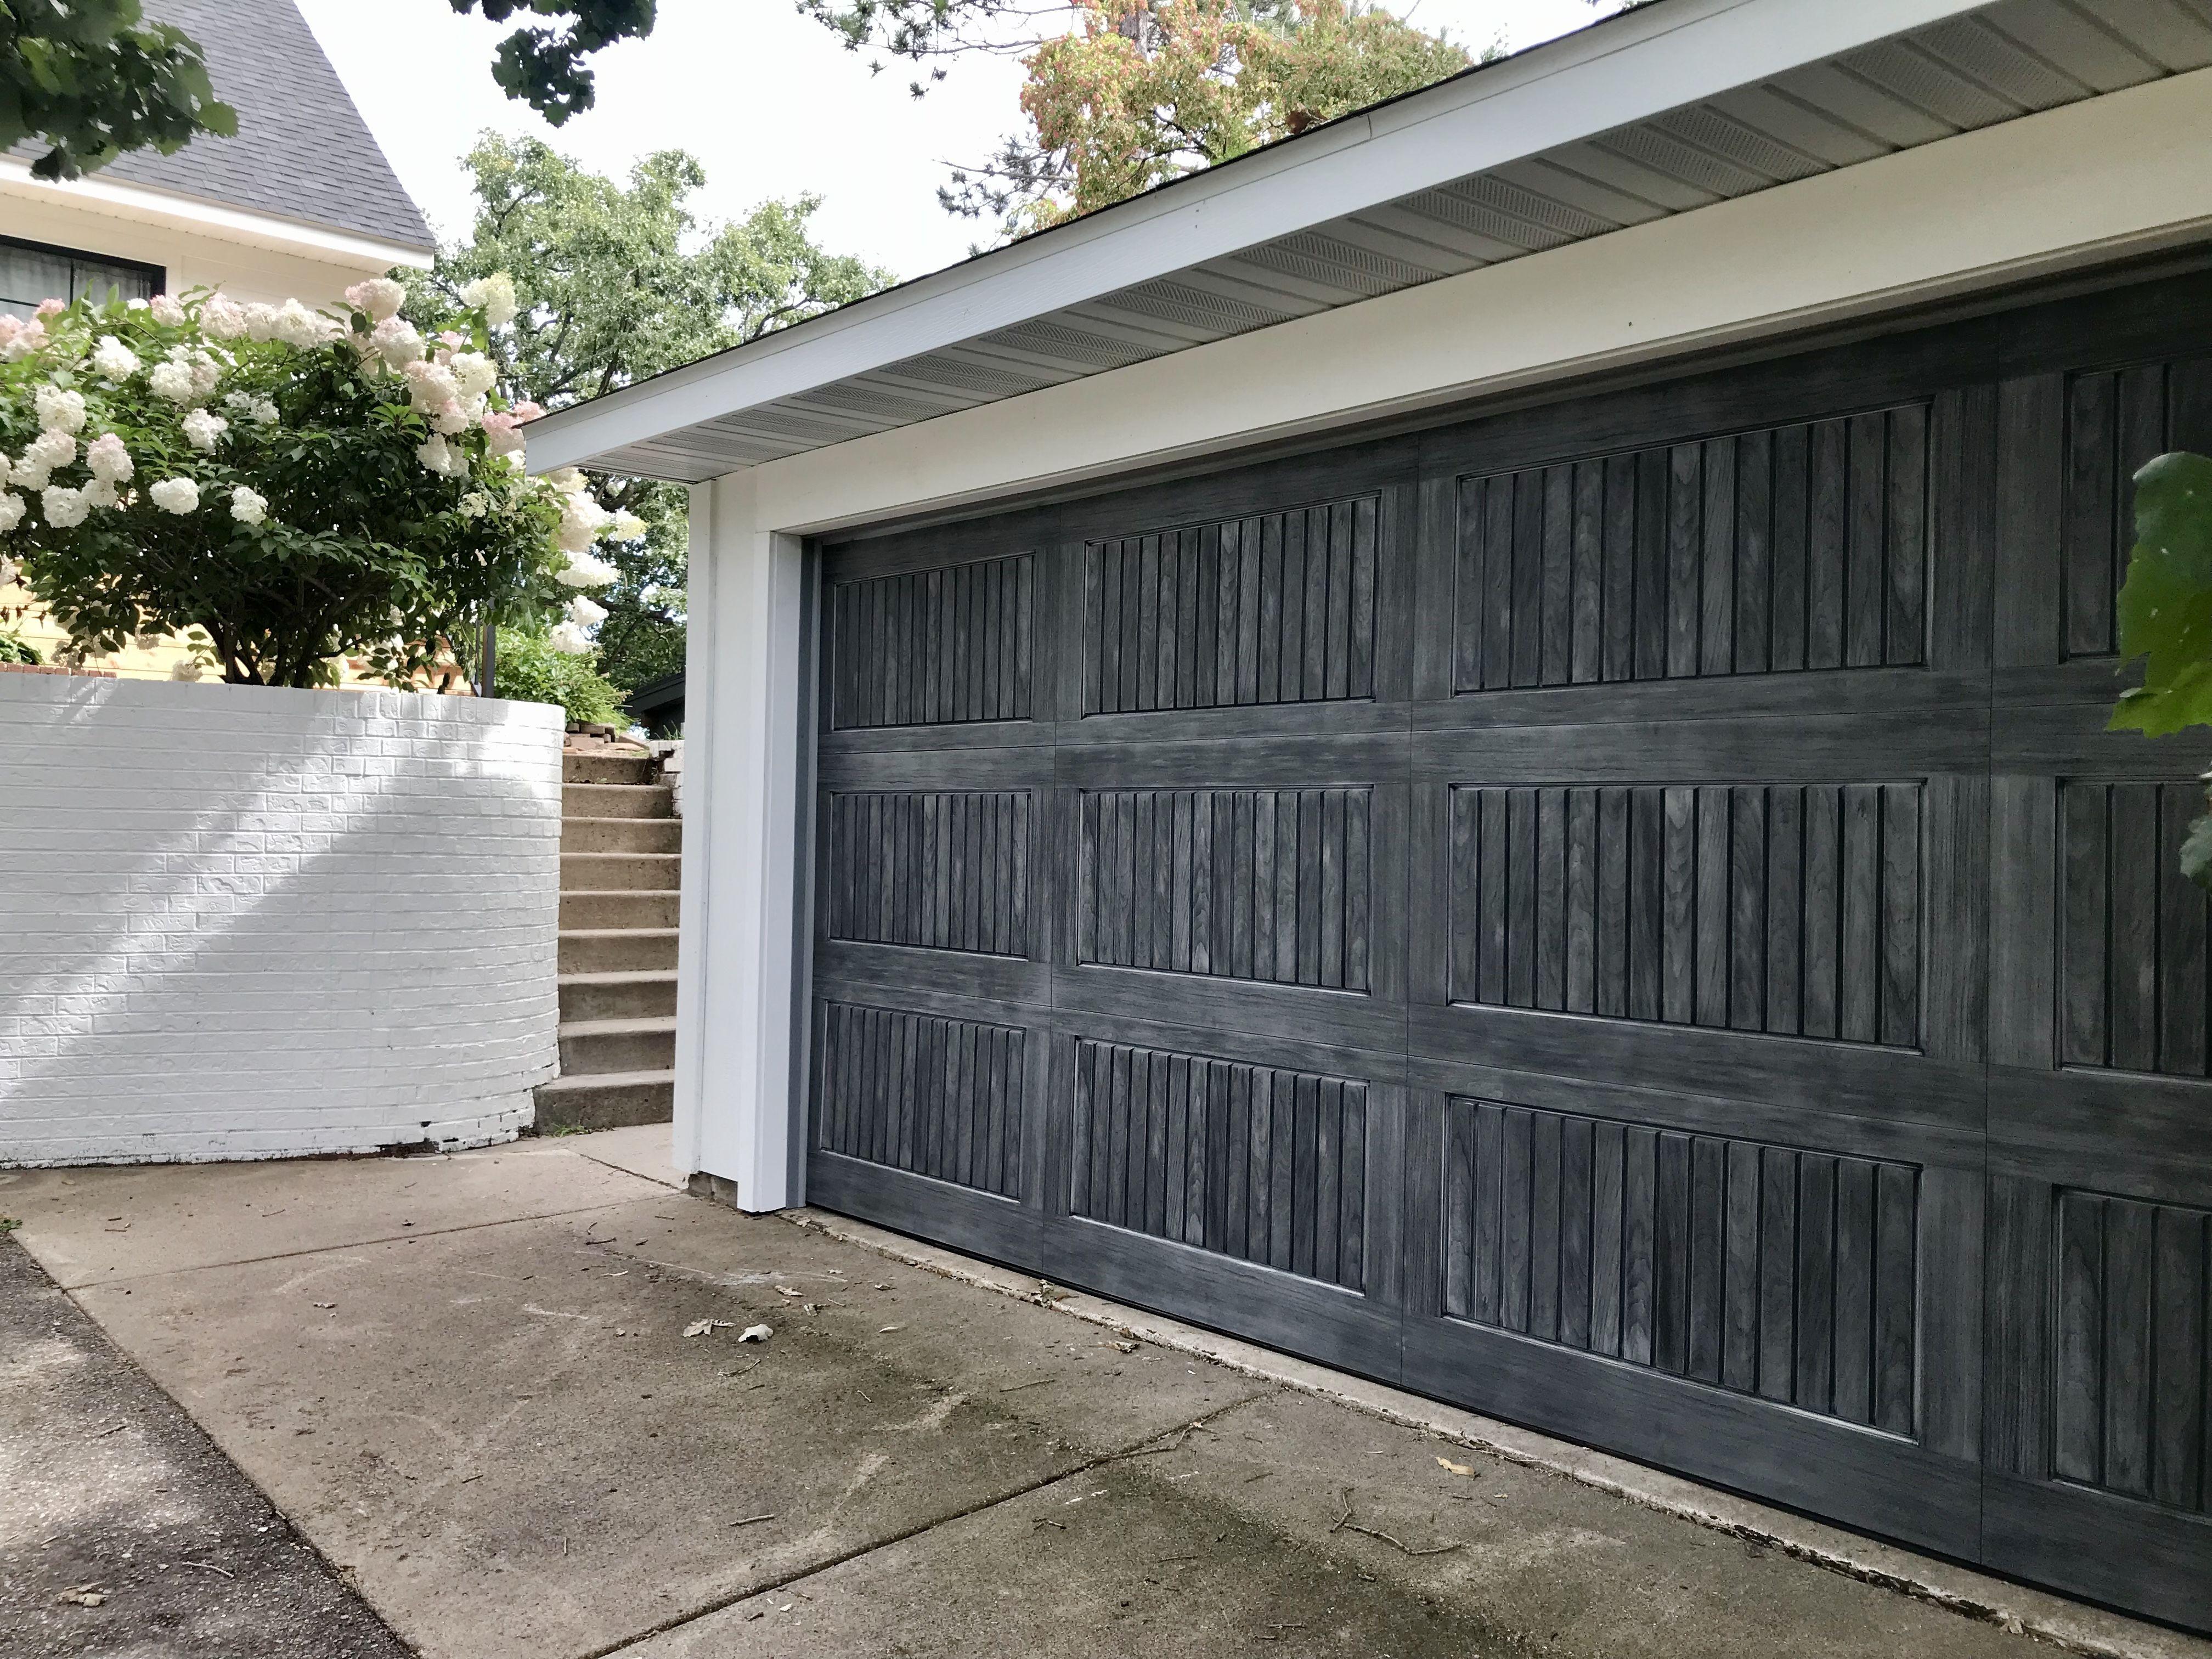 Wayne Dalton Fiberglass Garage Door Model 9800 In 2020 Fiberglass Garage Doors Garage Doors Garage Door Installation